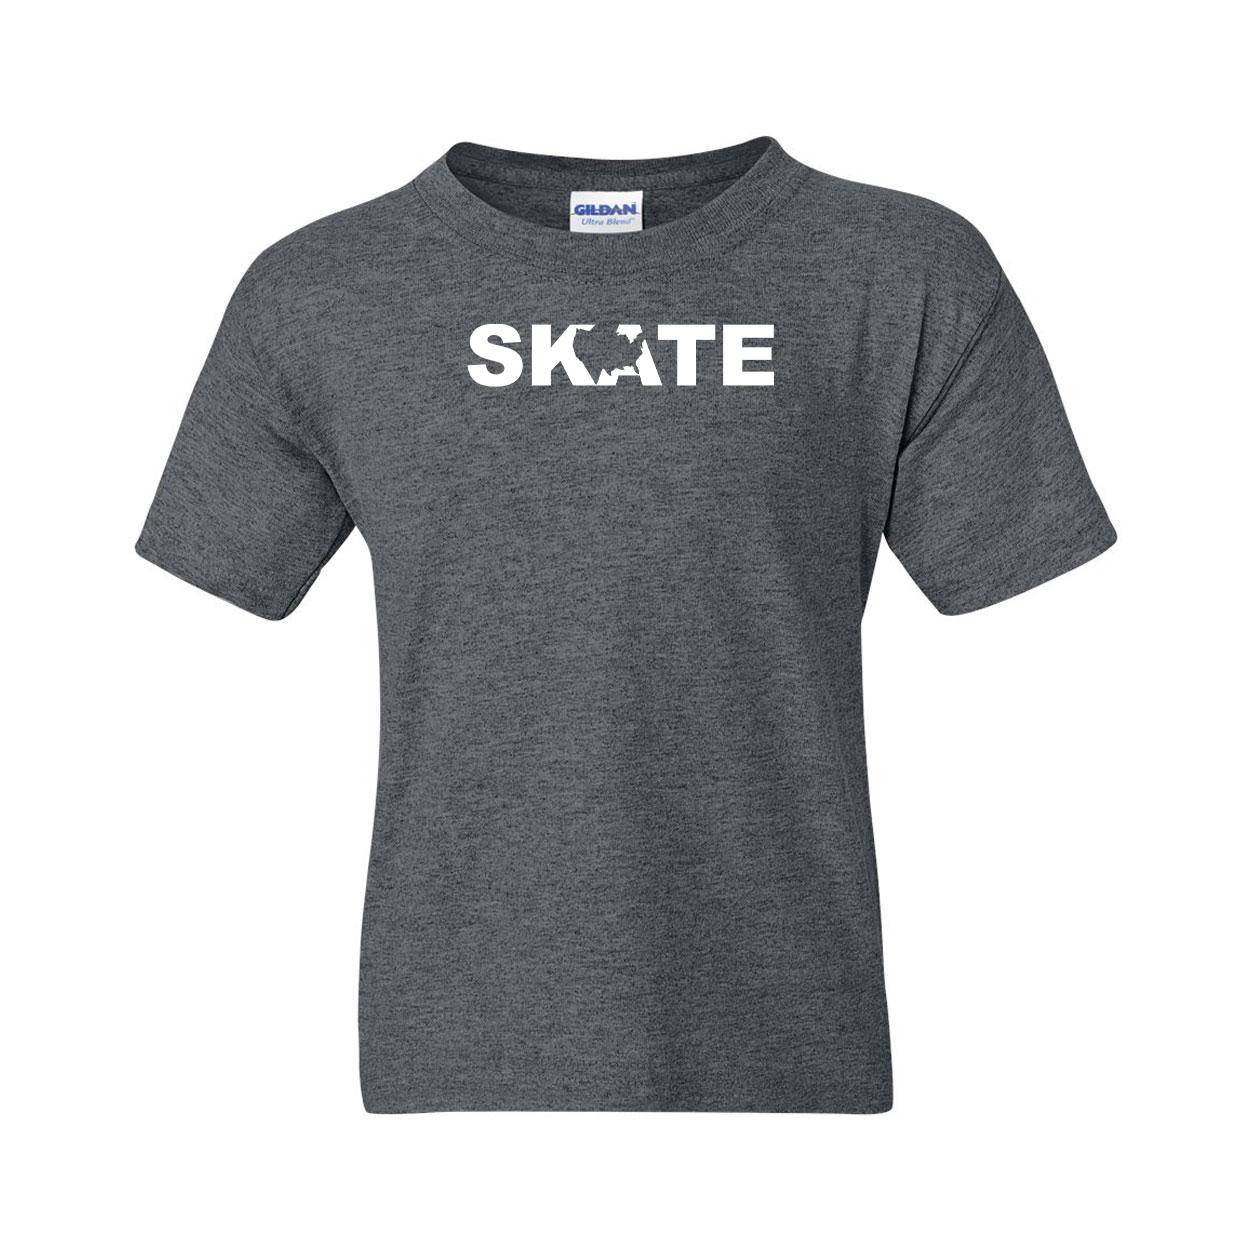 Skate United States Classic Youth T-Shirt Dark Heather Gray (White Logo)